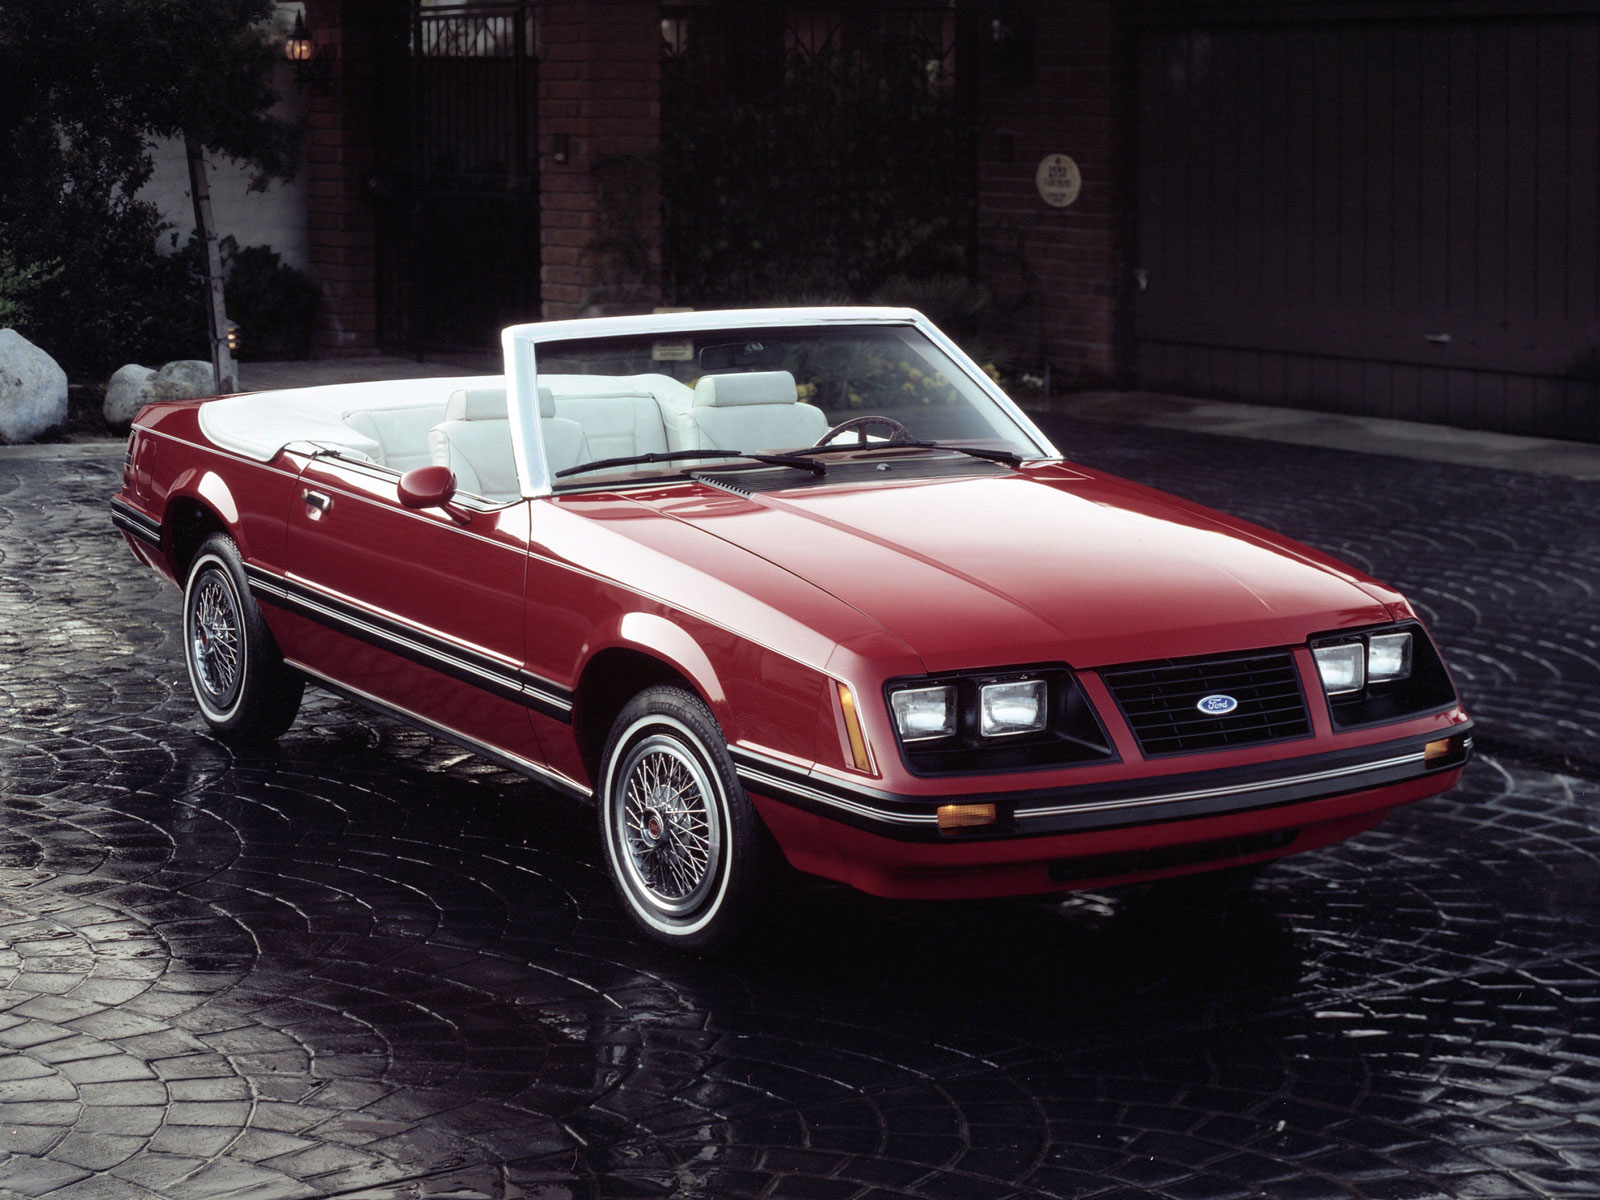 1983 1993 ford mustang cabrio autoguru. Black Bedroom Furniture Sets. Home Design Ideas